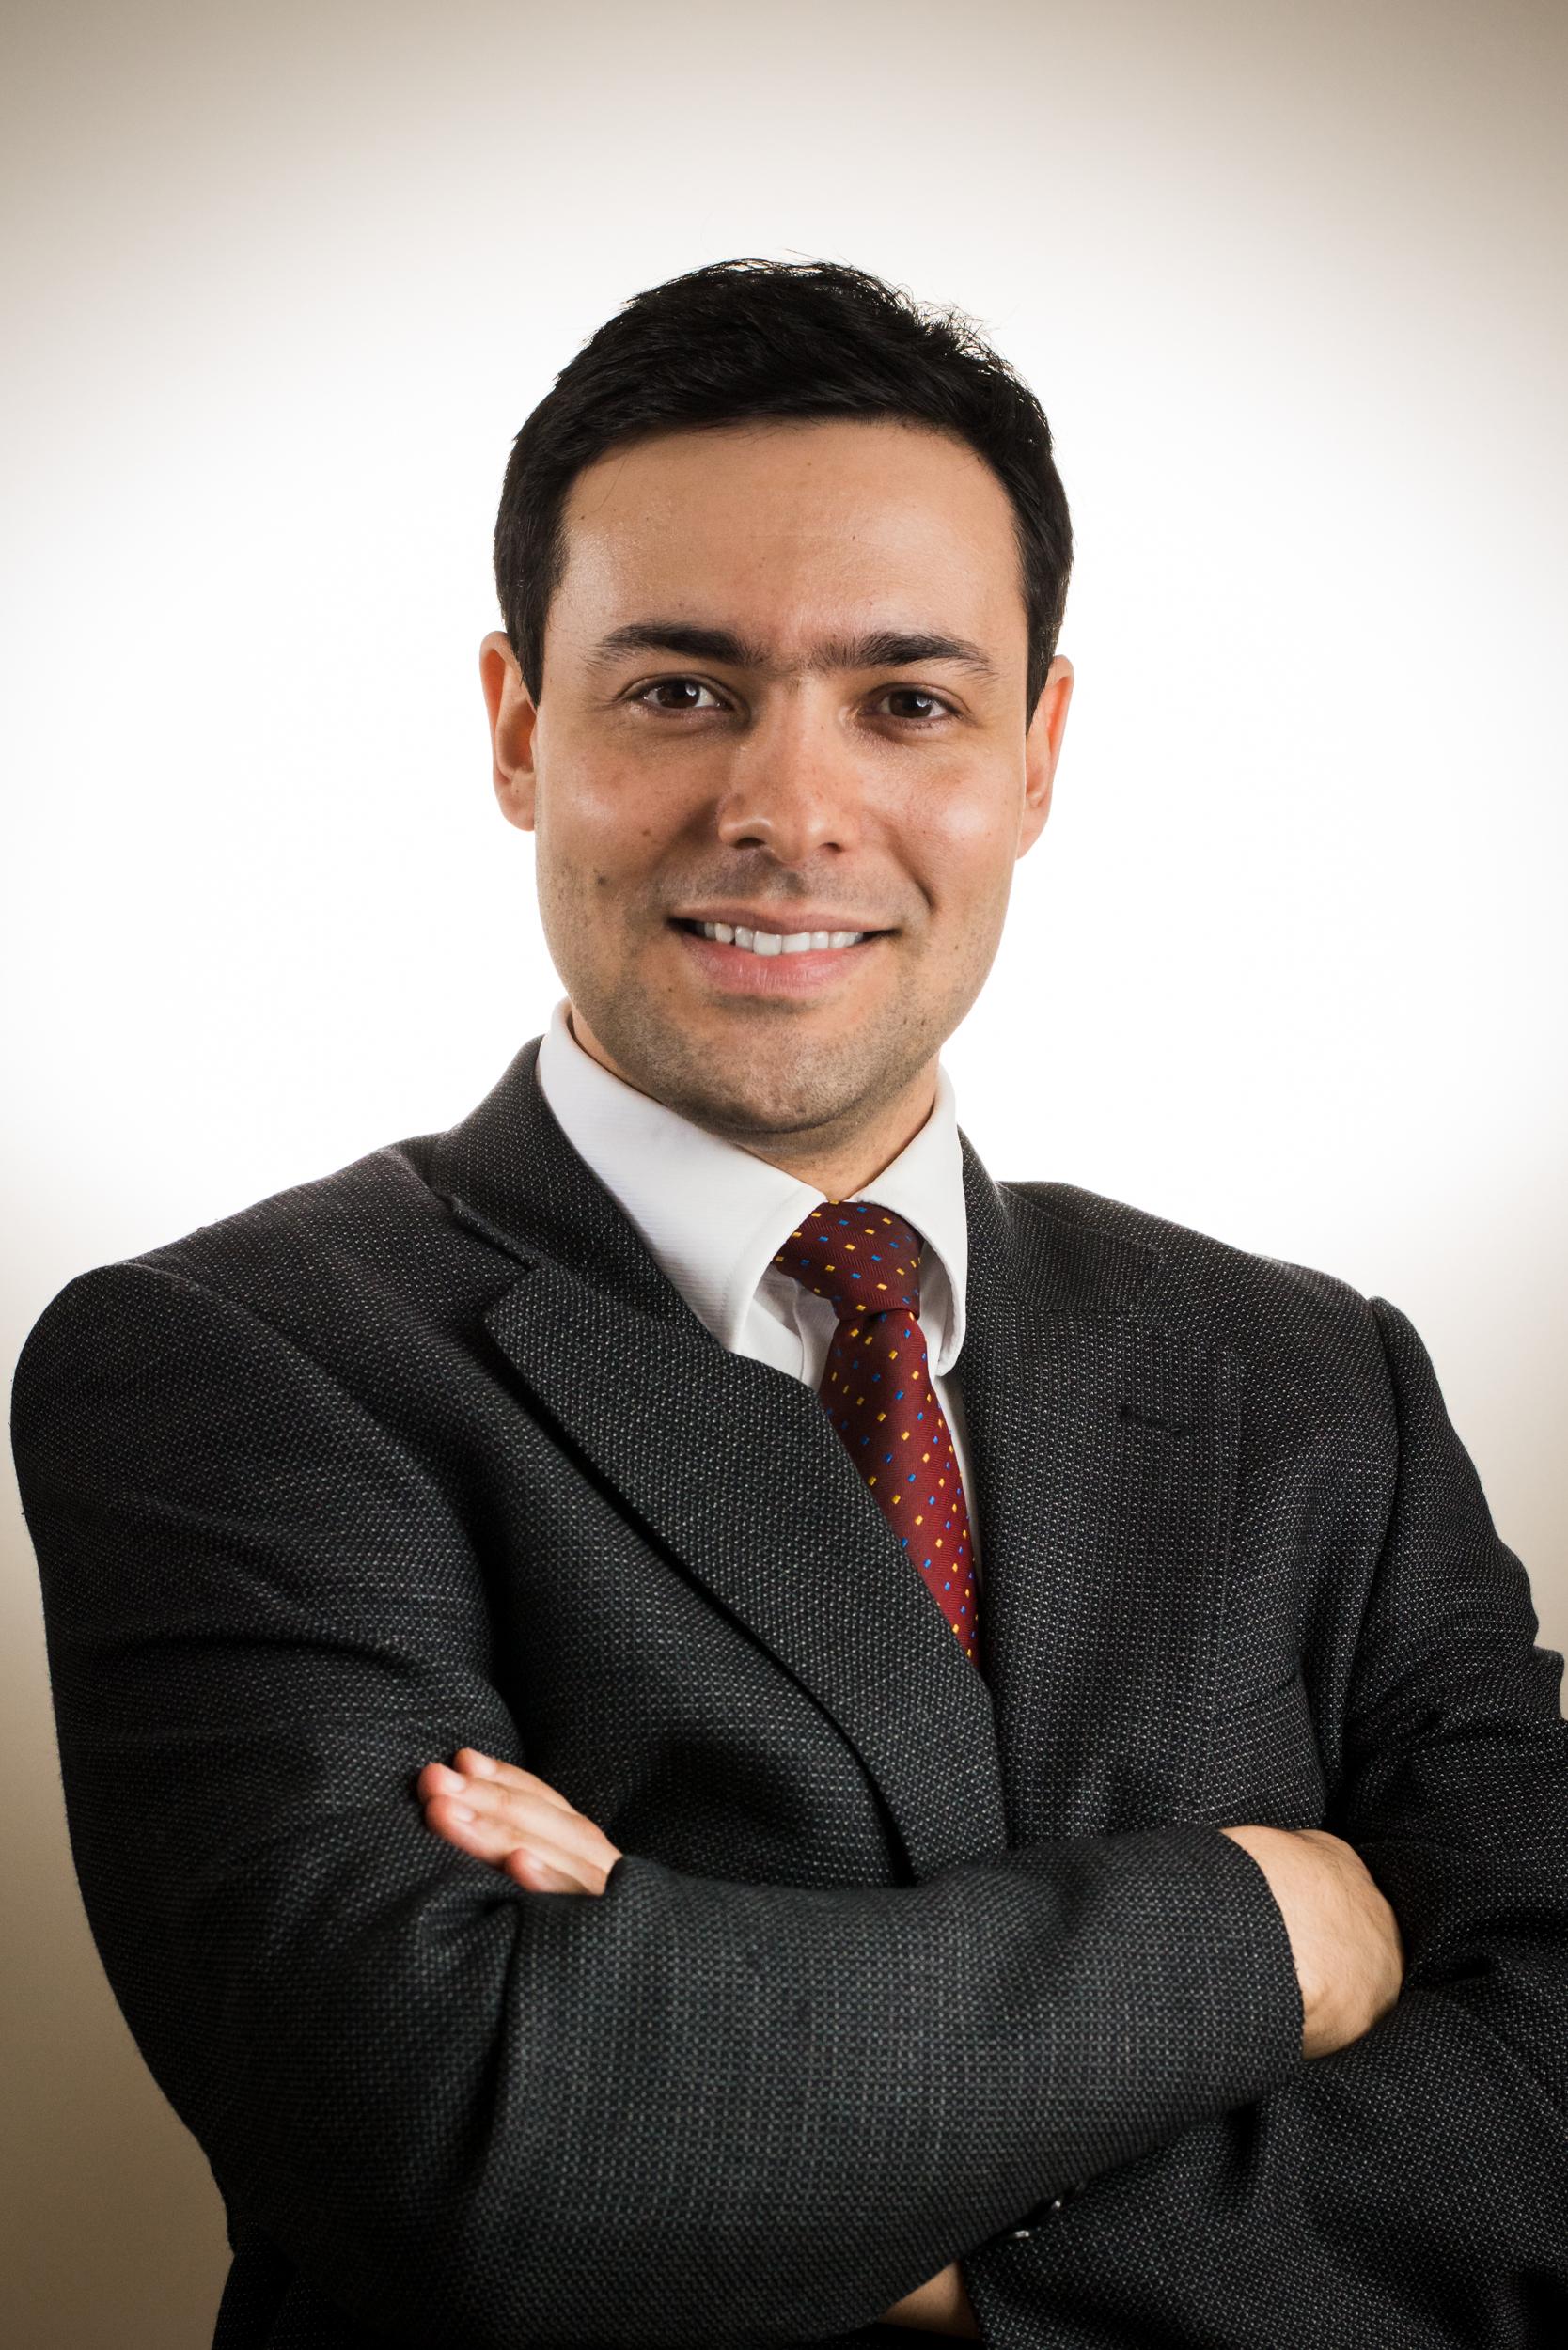 Gustavo Gomes